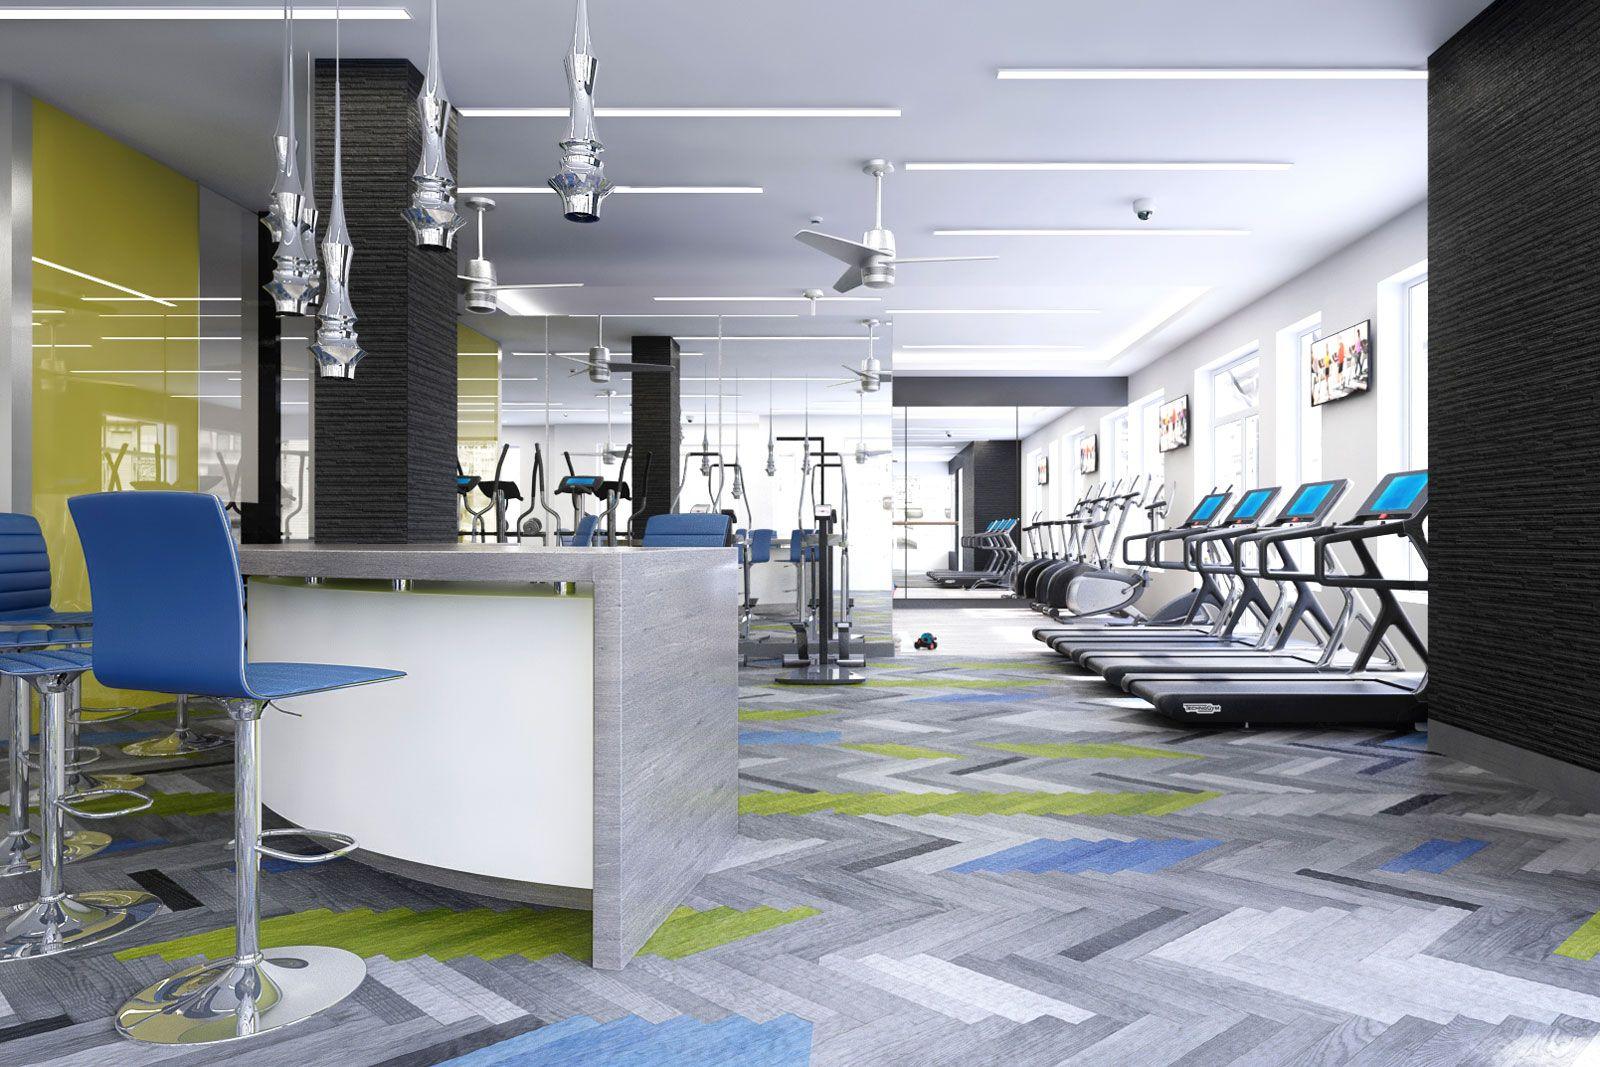 Modern Gym #AscendApollo #Vidazme #InteriorDesign #InteriorArchitecture #ModernInterior #FitnessRoom #MultiFamily